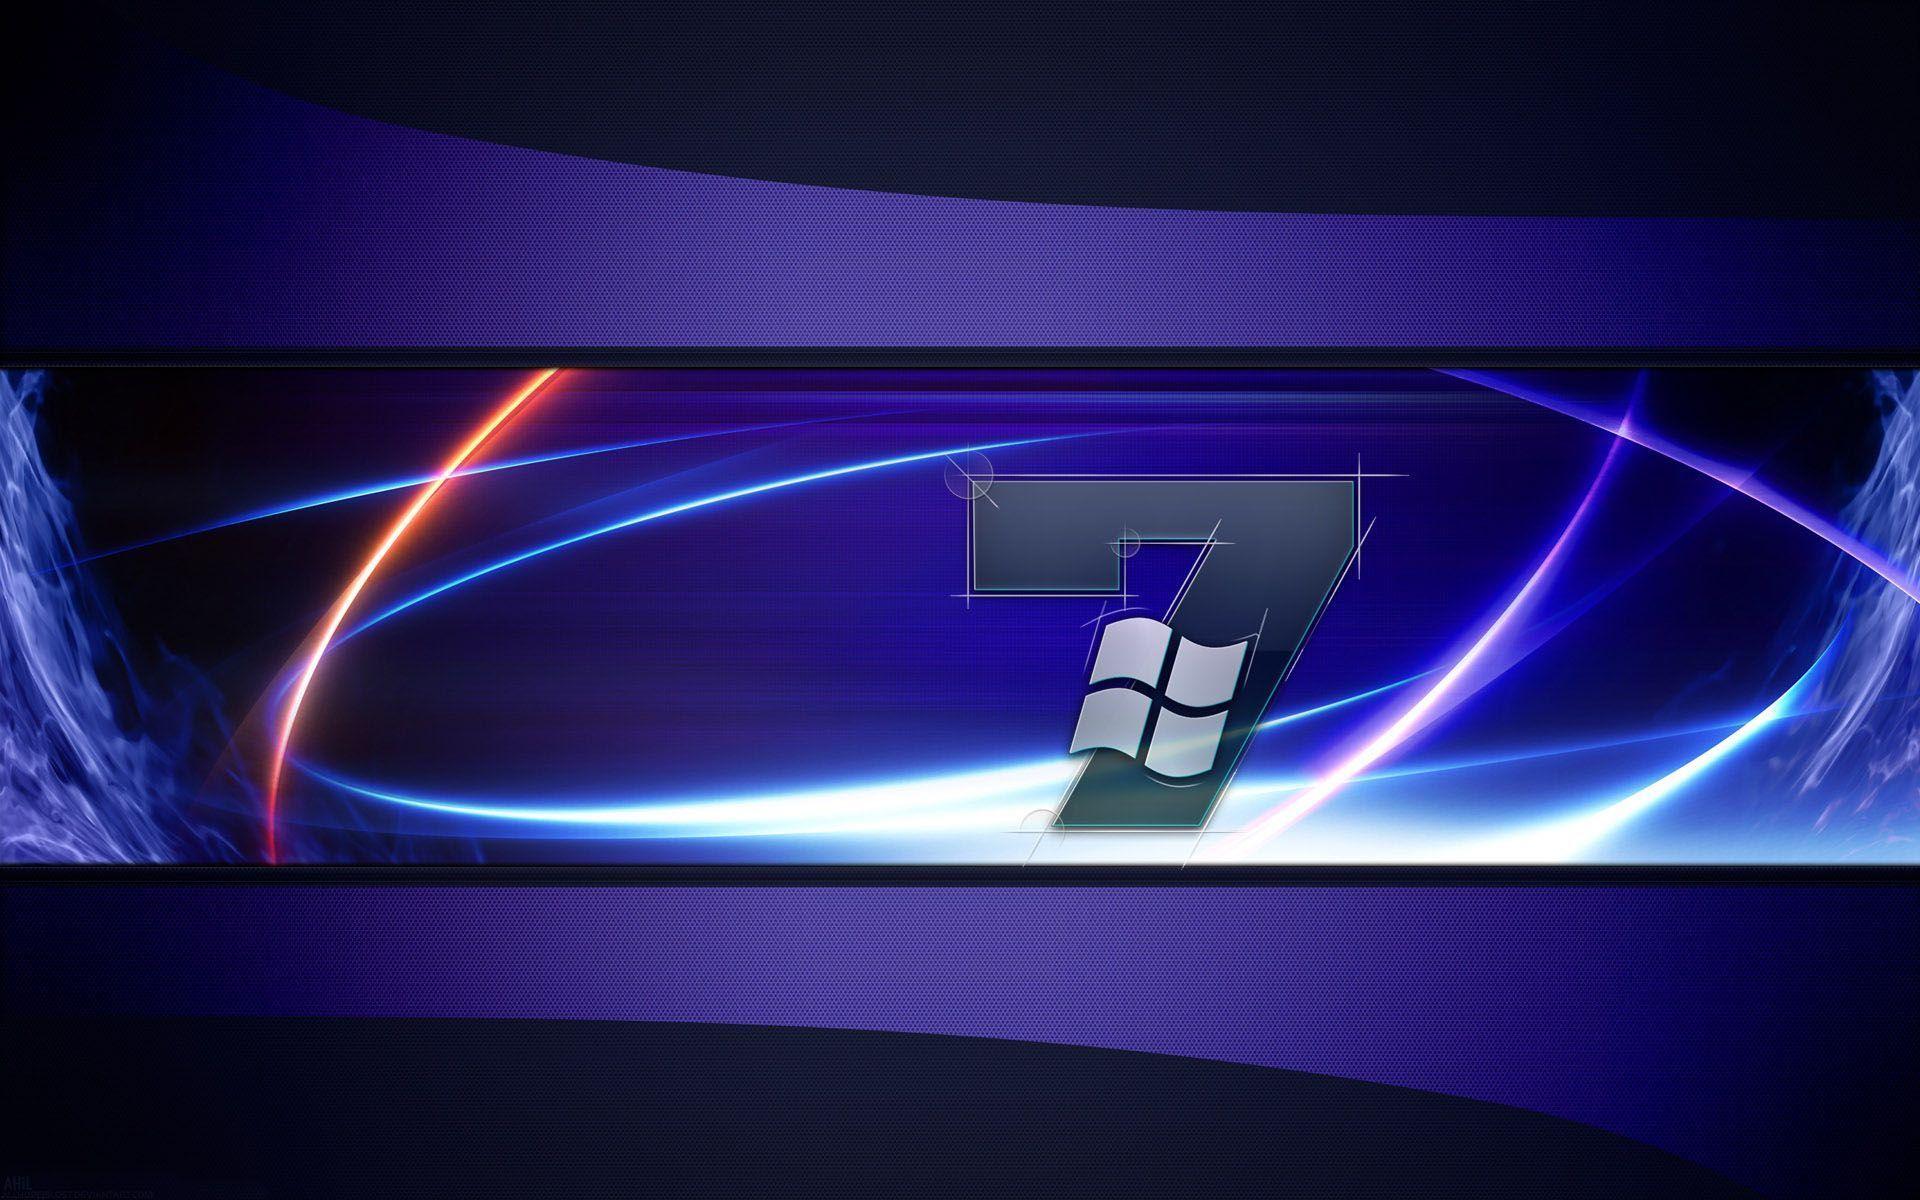 free download 3d live wallpaper for windows 7 car